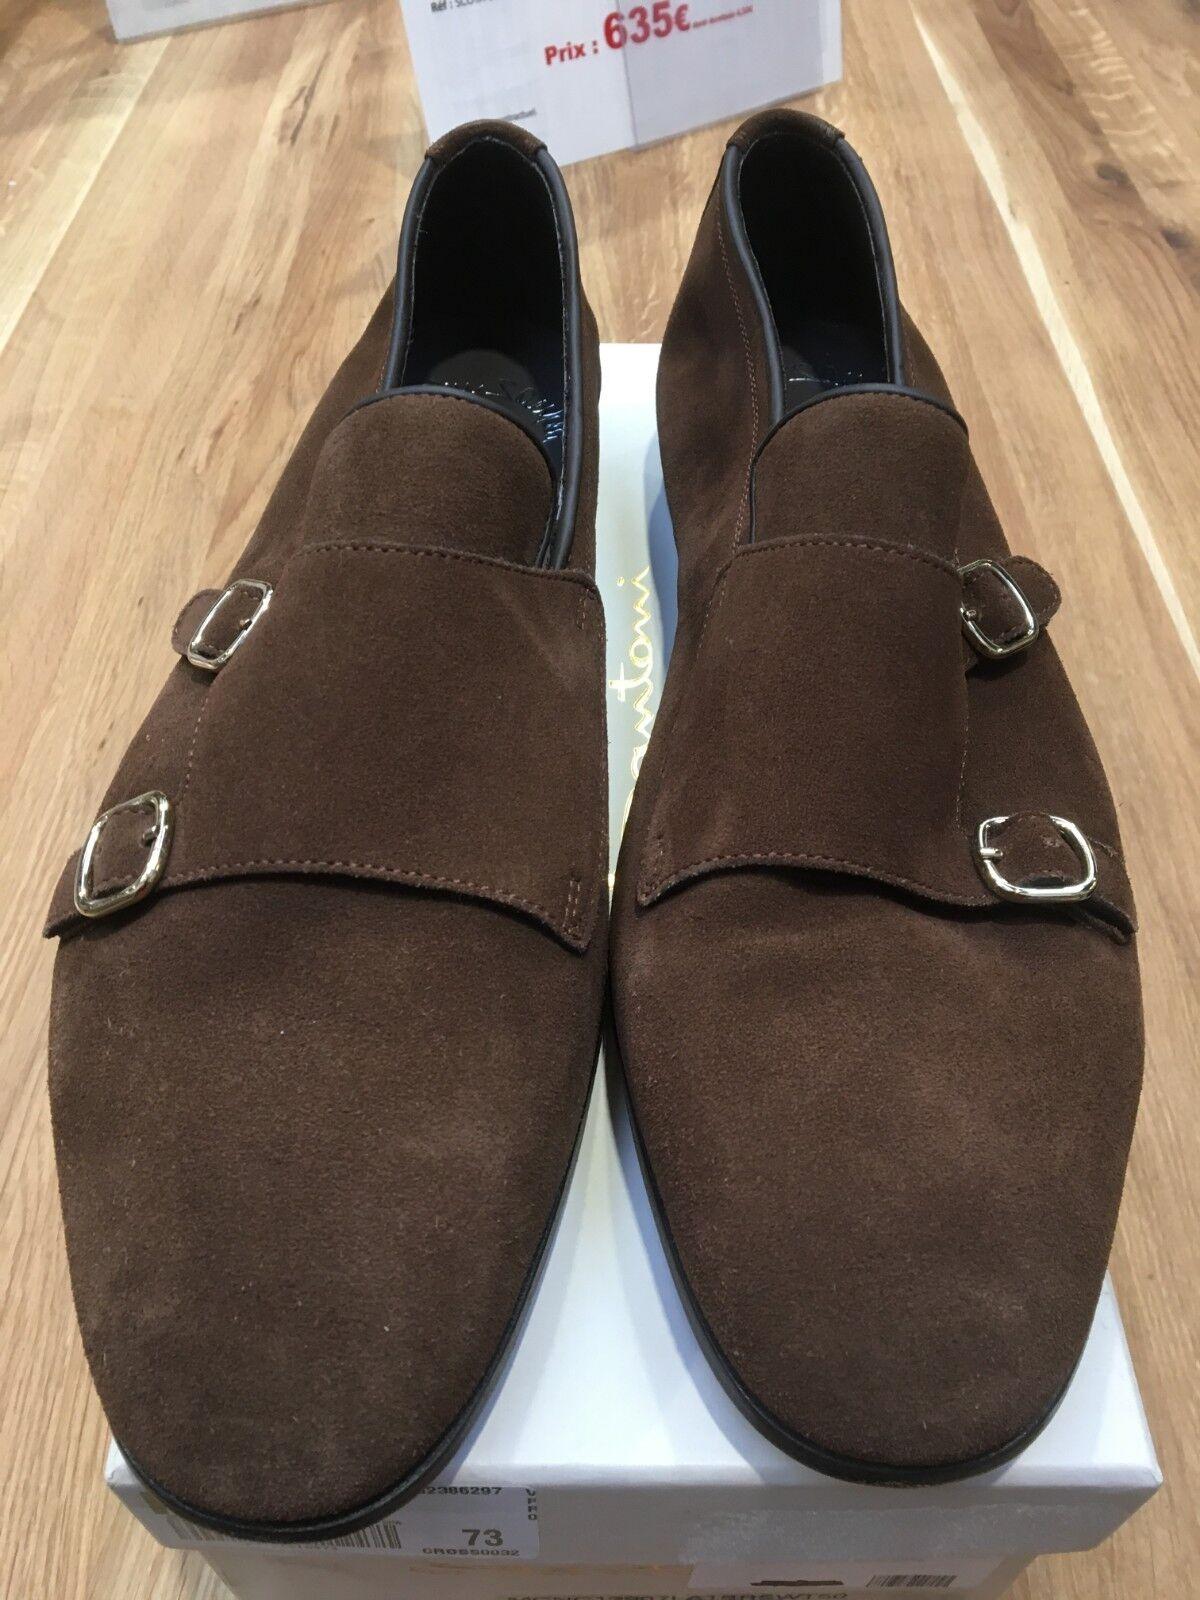 Paires de chaussure double boucle daim Santon MCNC1907LA15RSNT50 Dimensione 10,5 | Reputazione affidabile  | Uomini/Donne Scarpa